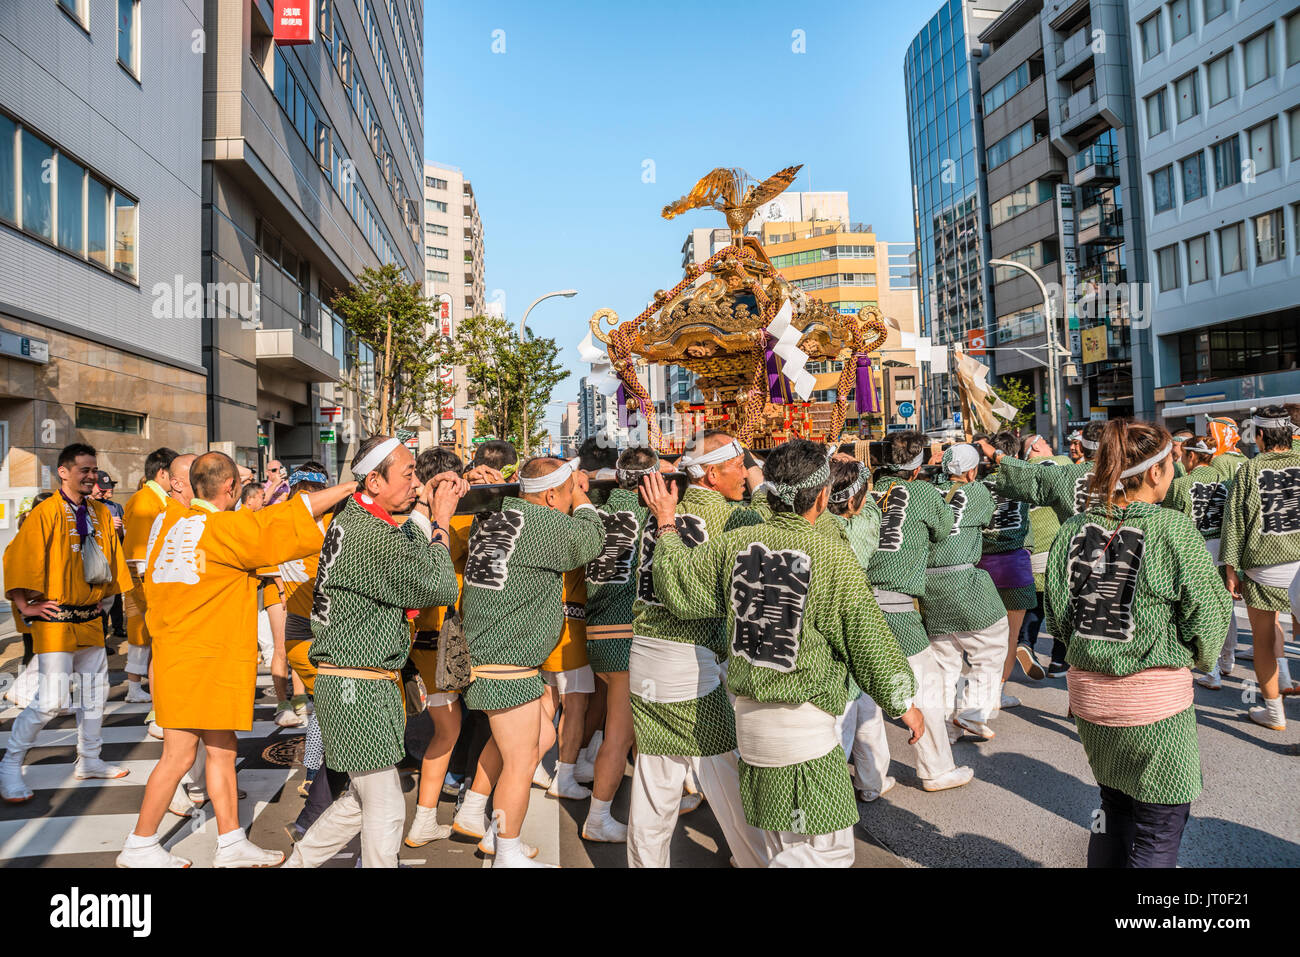 Small local group during Matsuri procession with portable float near Kappabashi-dori, Tokyo, Japan - Stock Image